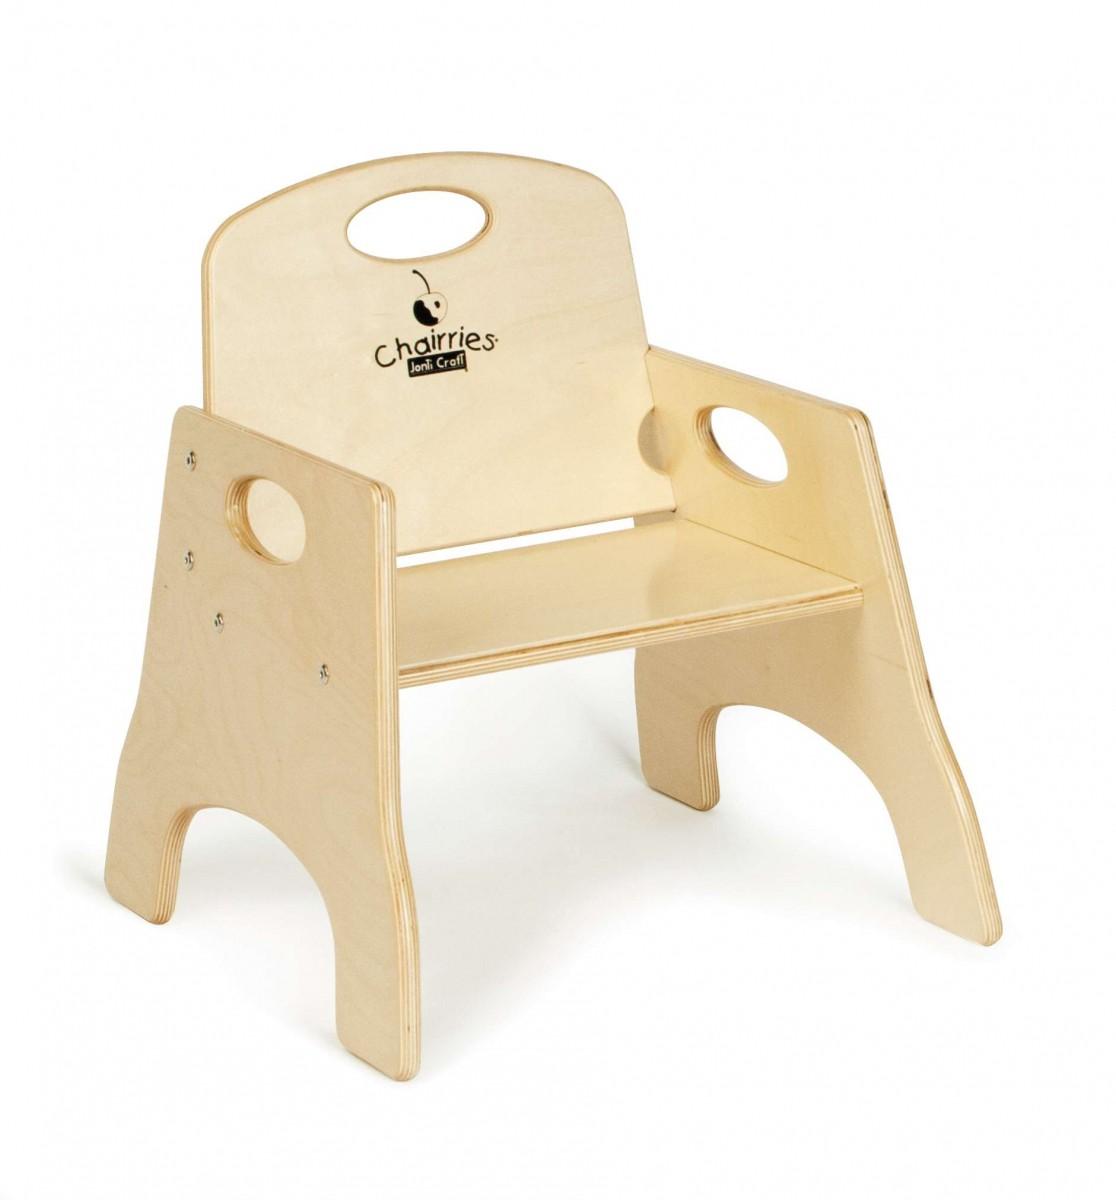 Jonti Craft Chairries Parts